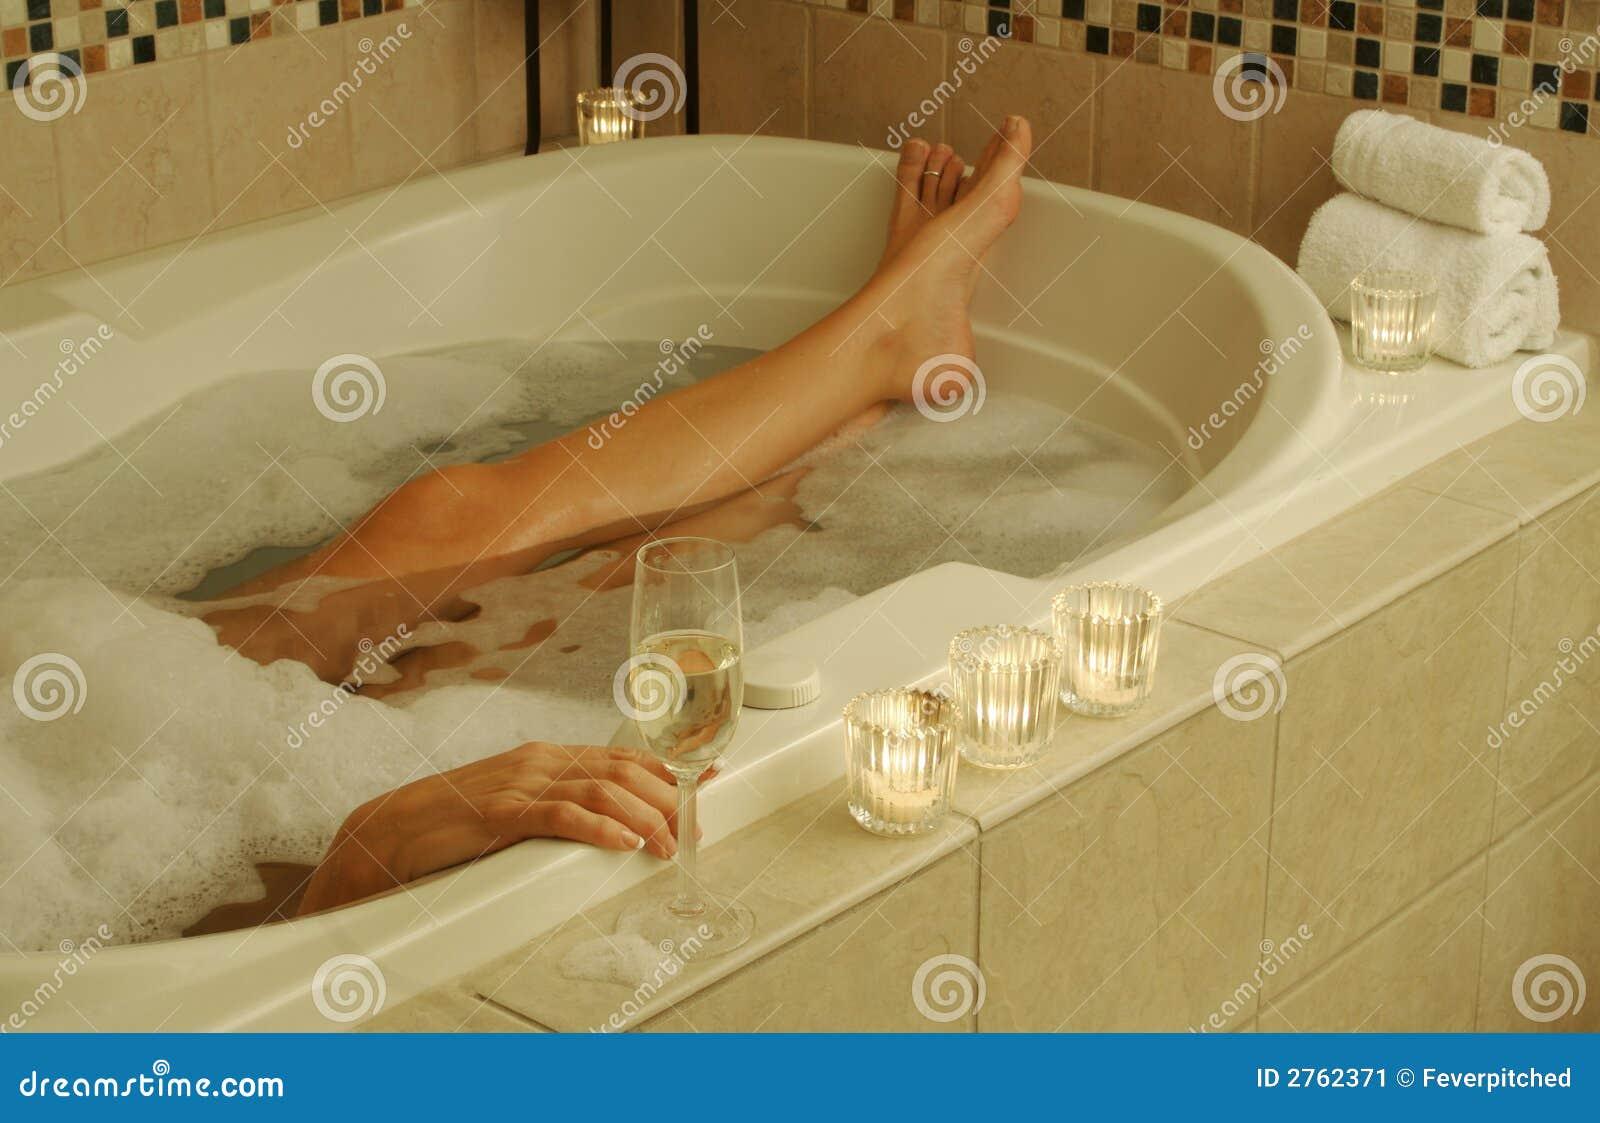 Bathroom Relaxation